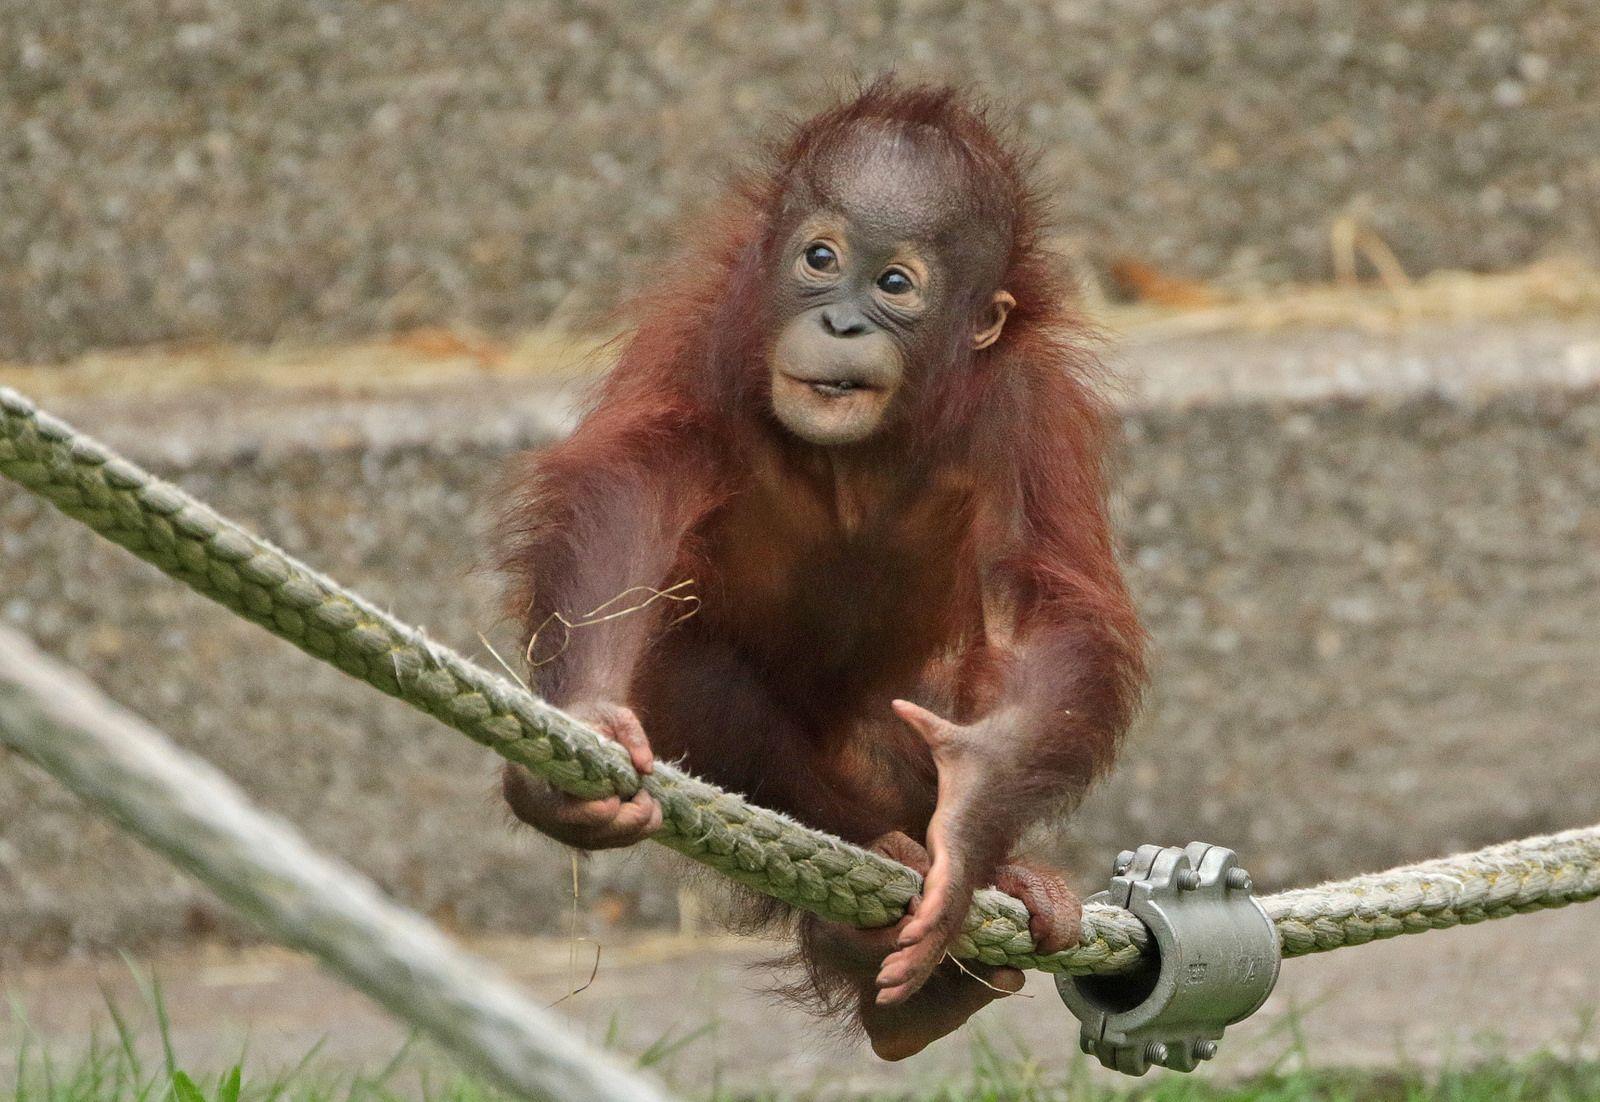 Sumatran Orangutan Sabbar Ouwehands Bb2a2761 Orangutan Sumatran Orangutan Cute Monkey